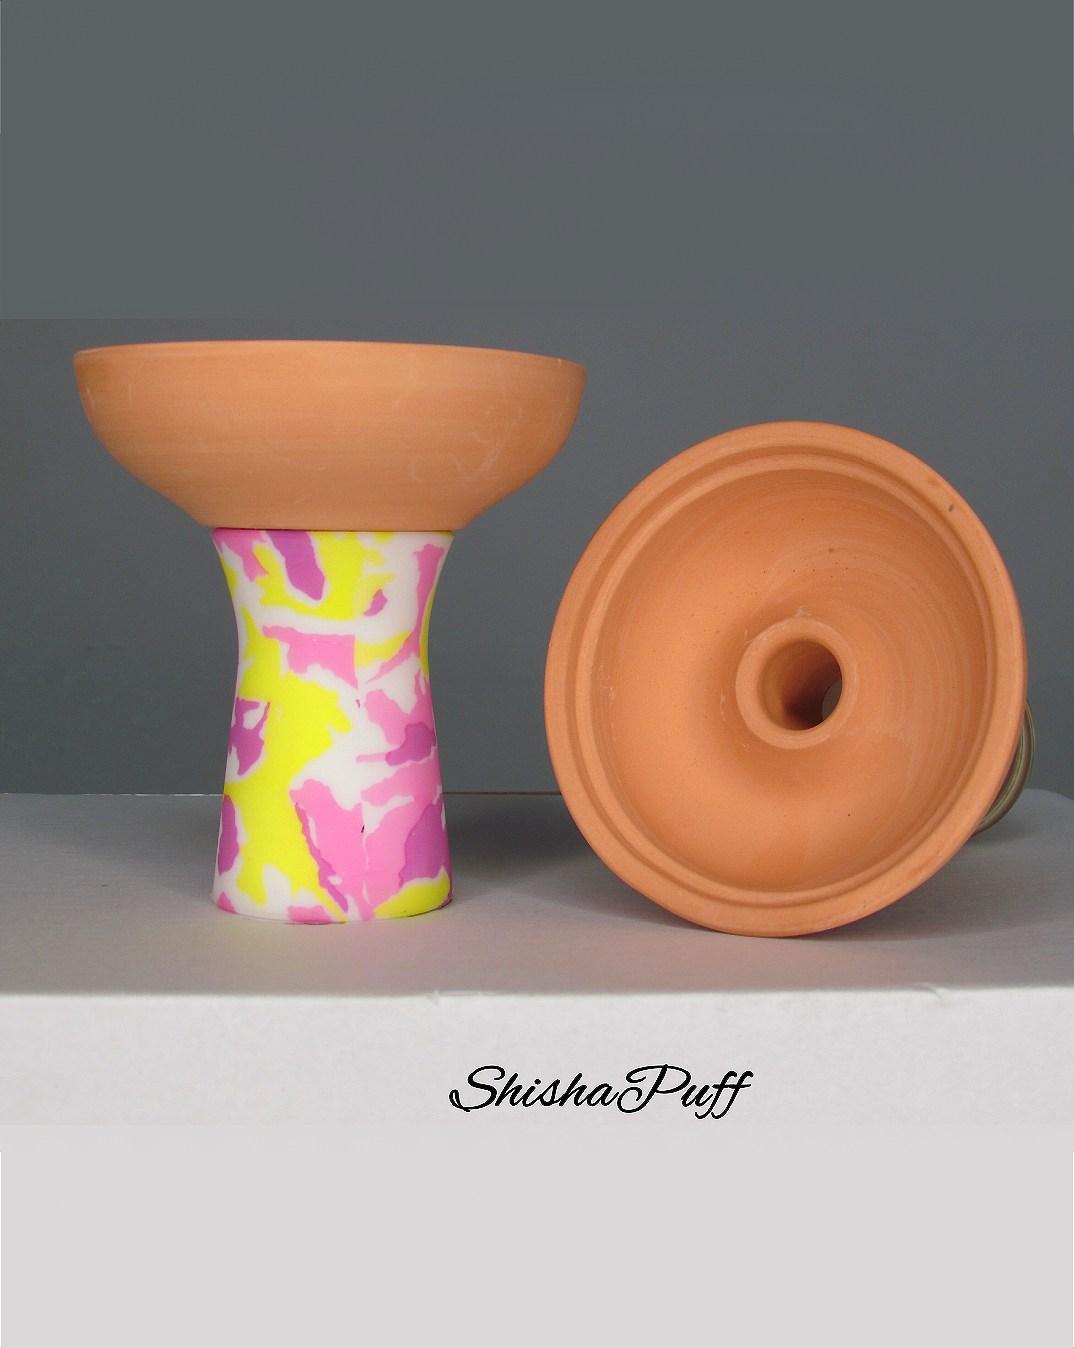 Silicone Ceramic Head rose Round bowl hookah For Kaloud - Shisha Puff Cyprus Hookah